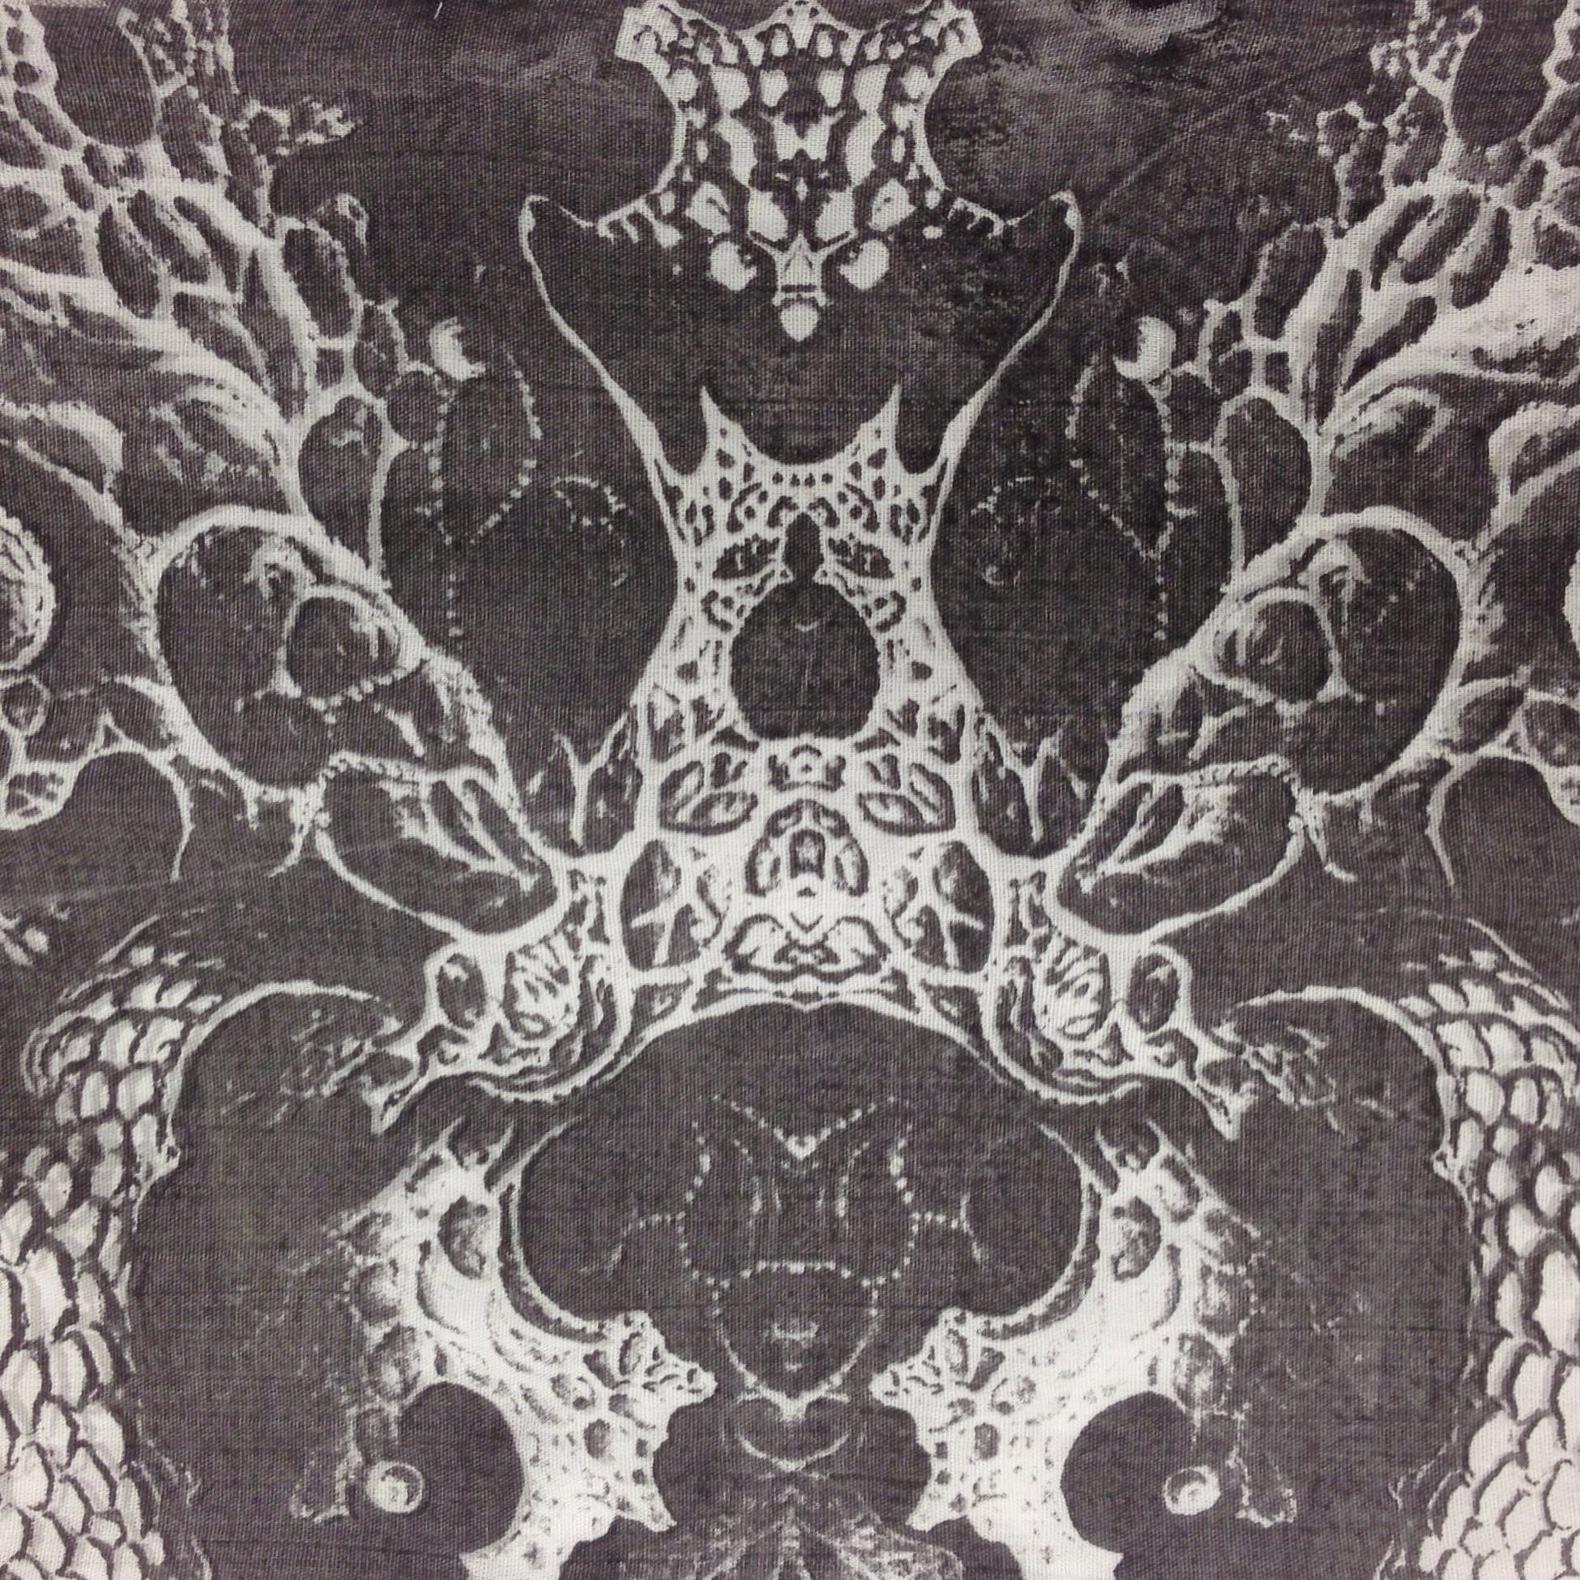 Early Stage Fabrics5.JPG